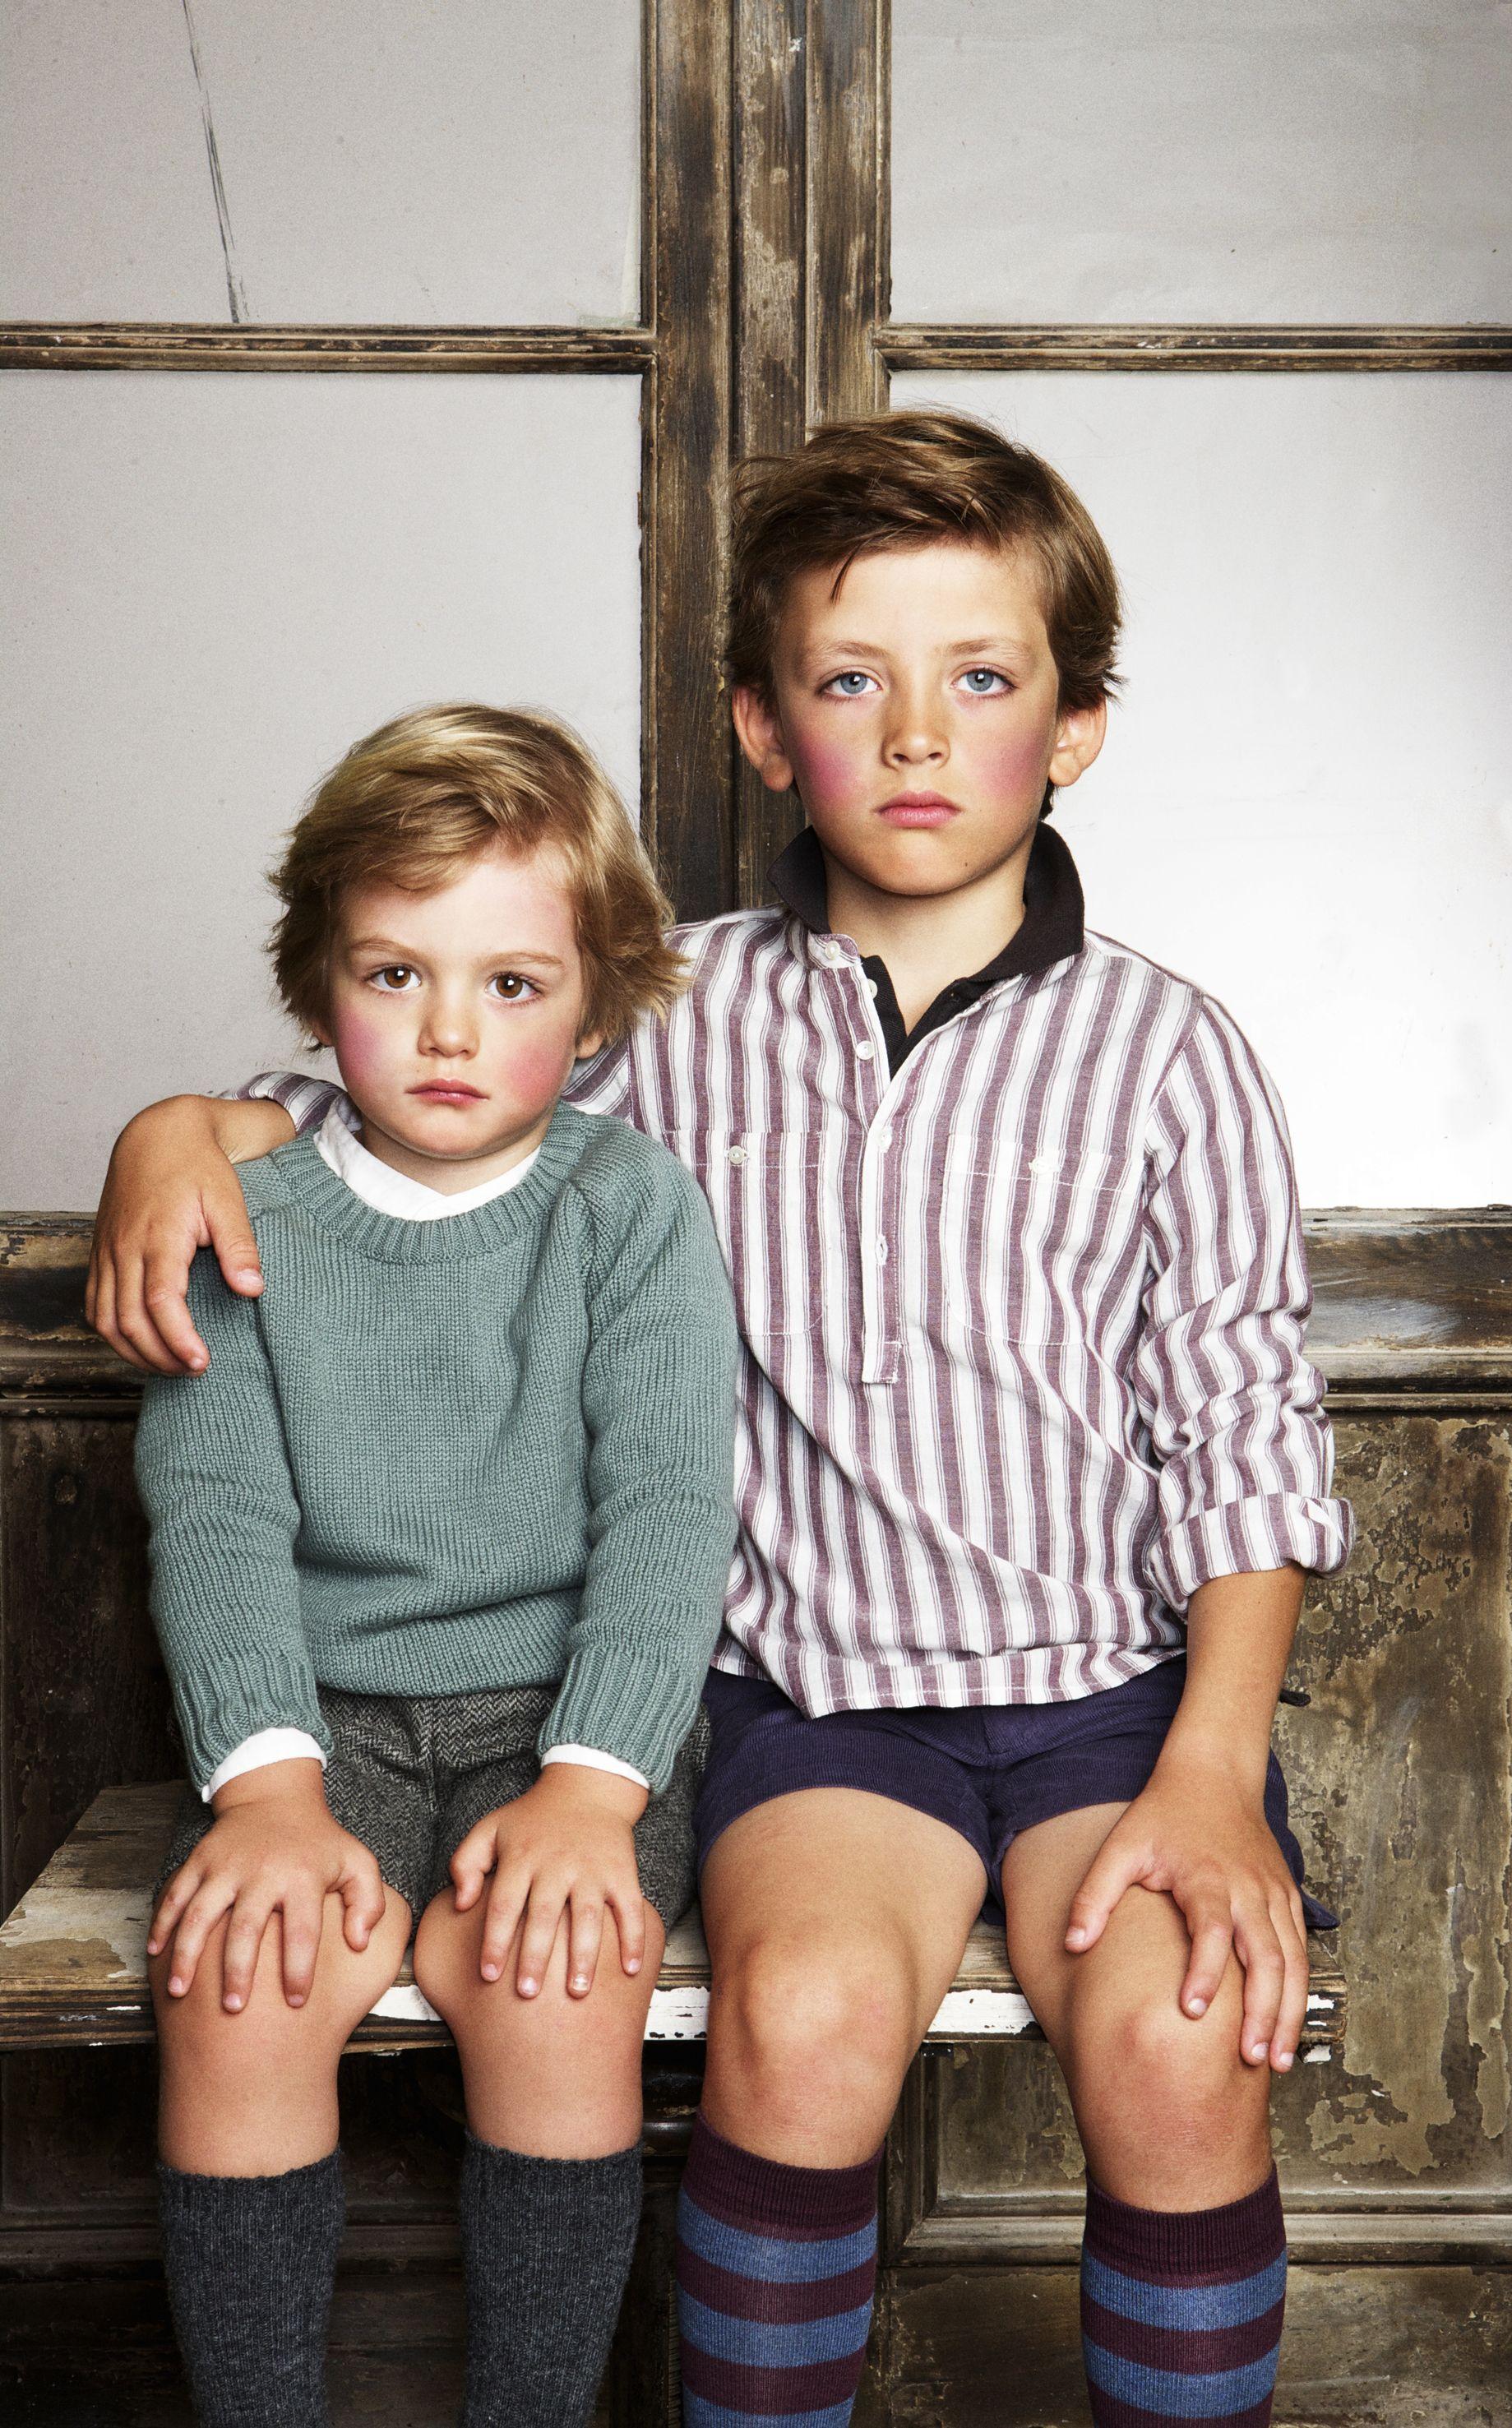 children photography calculator sock - 736×1181